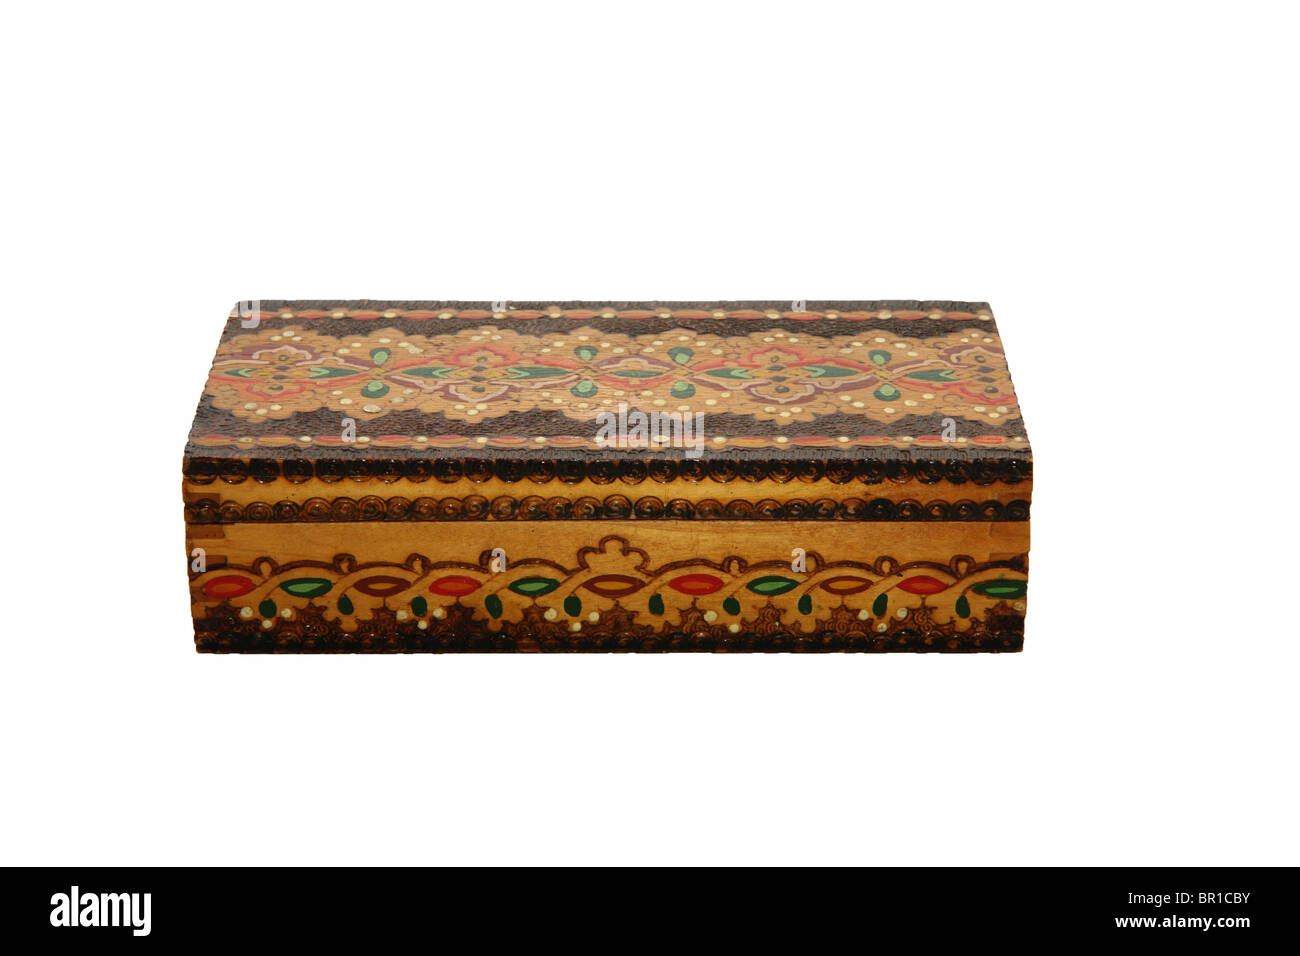 Wooden jewel box isolated on white - Stock Image